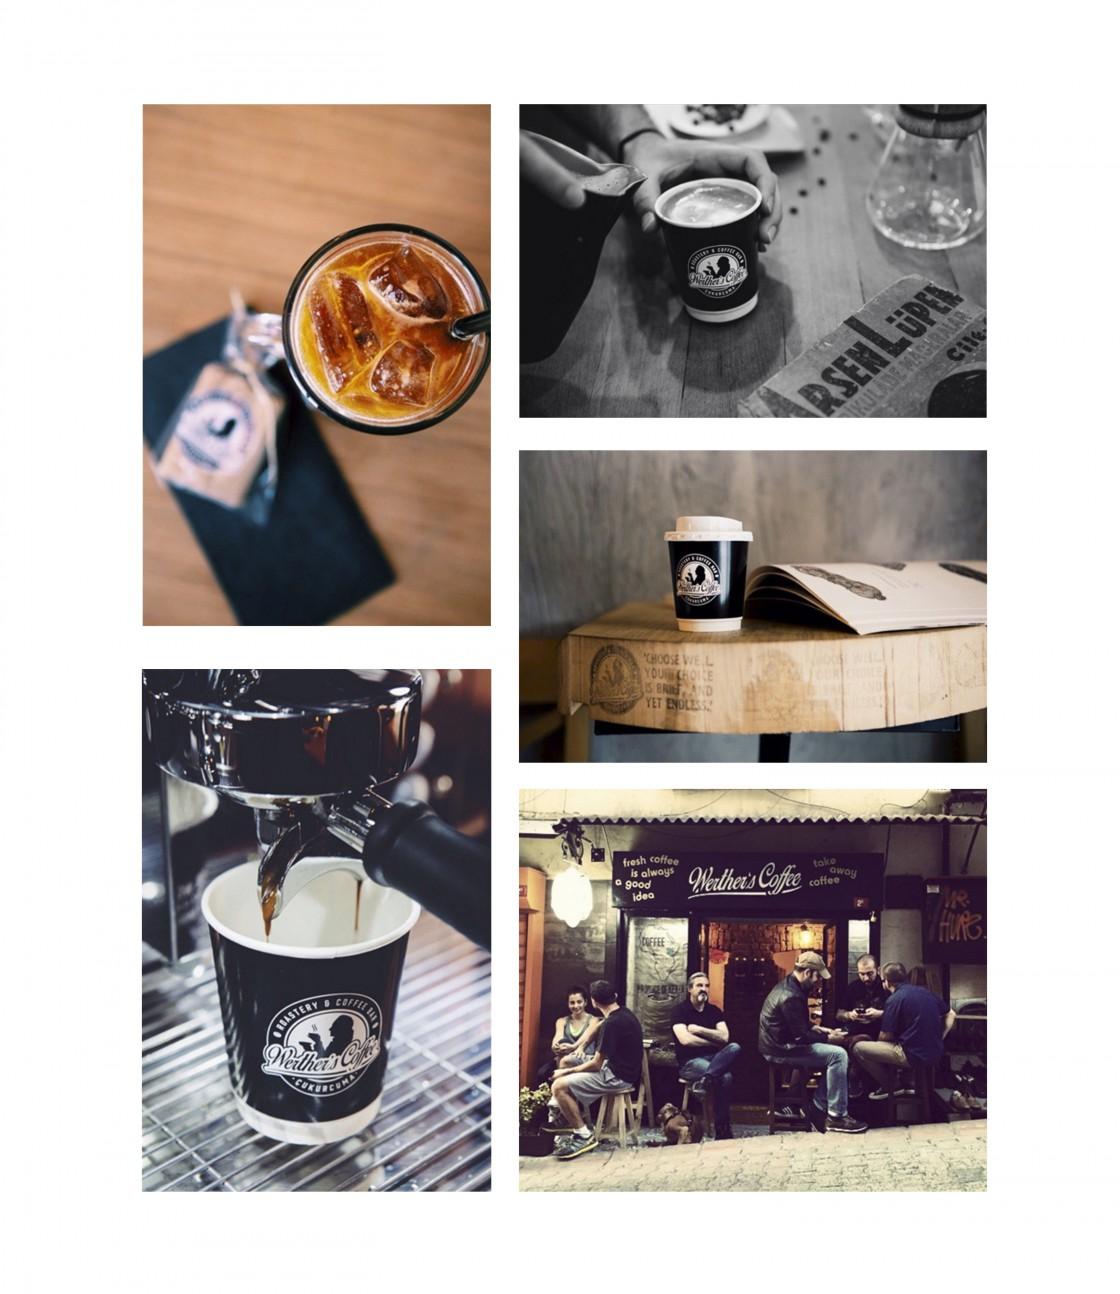 05_Werthers_Coffee_karton_bardak